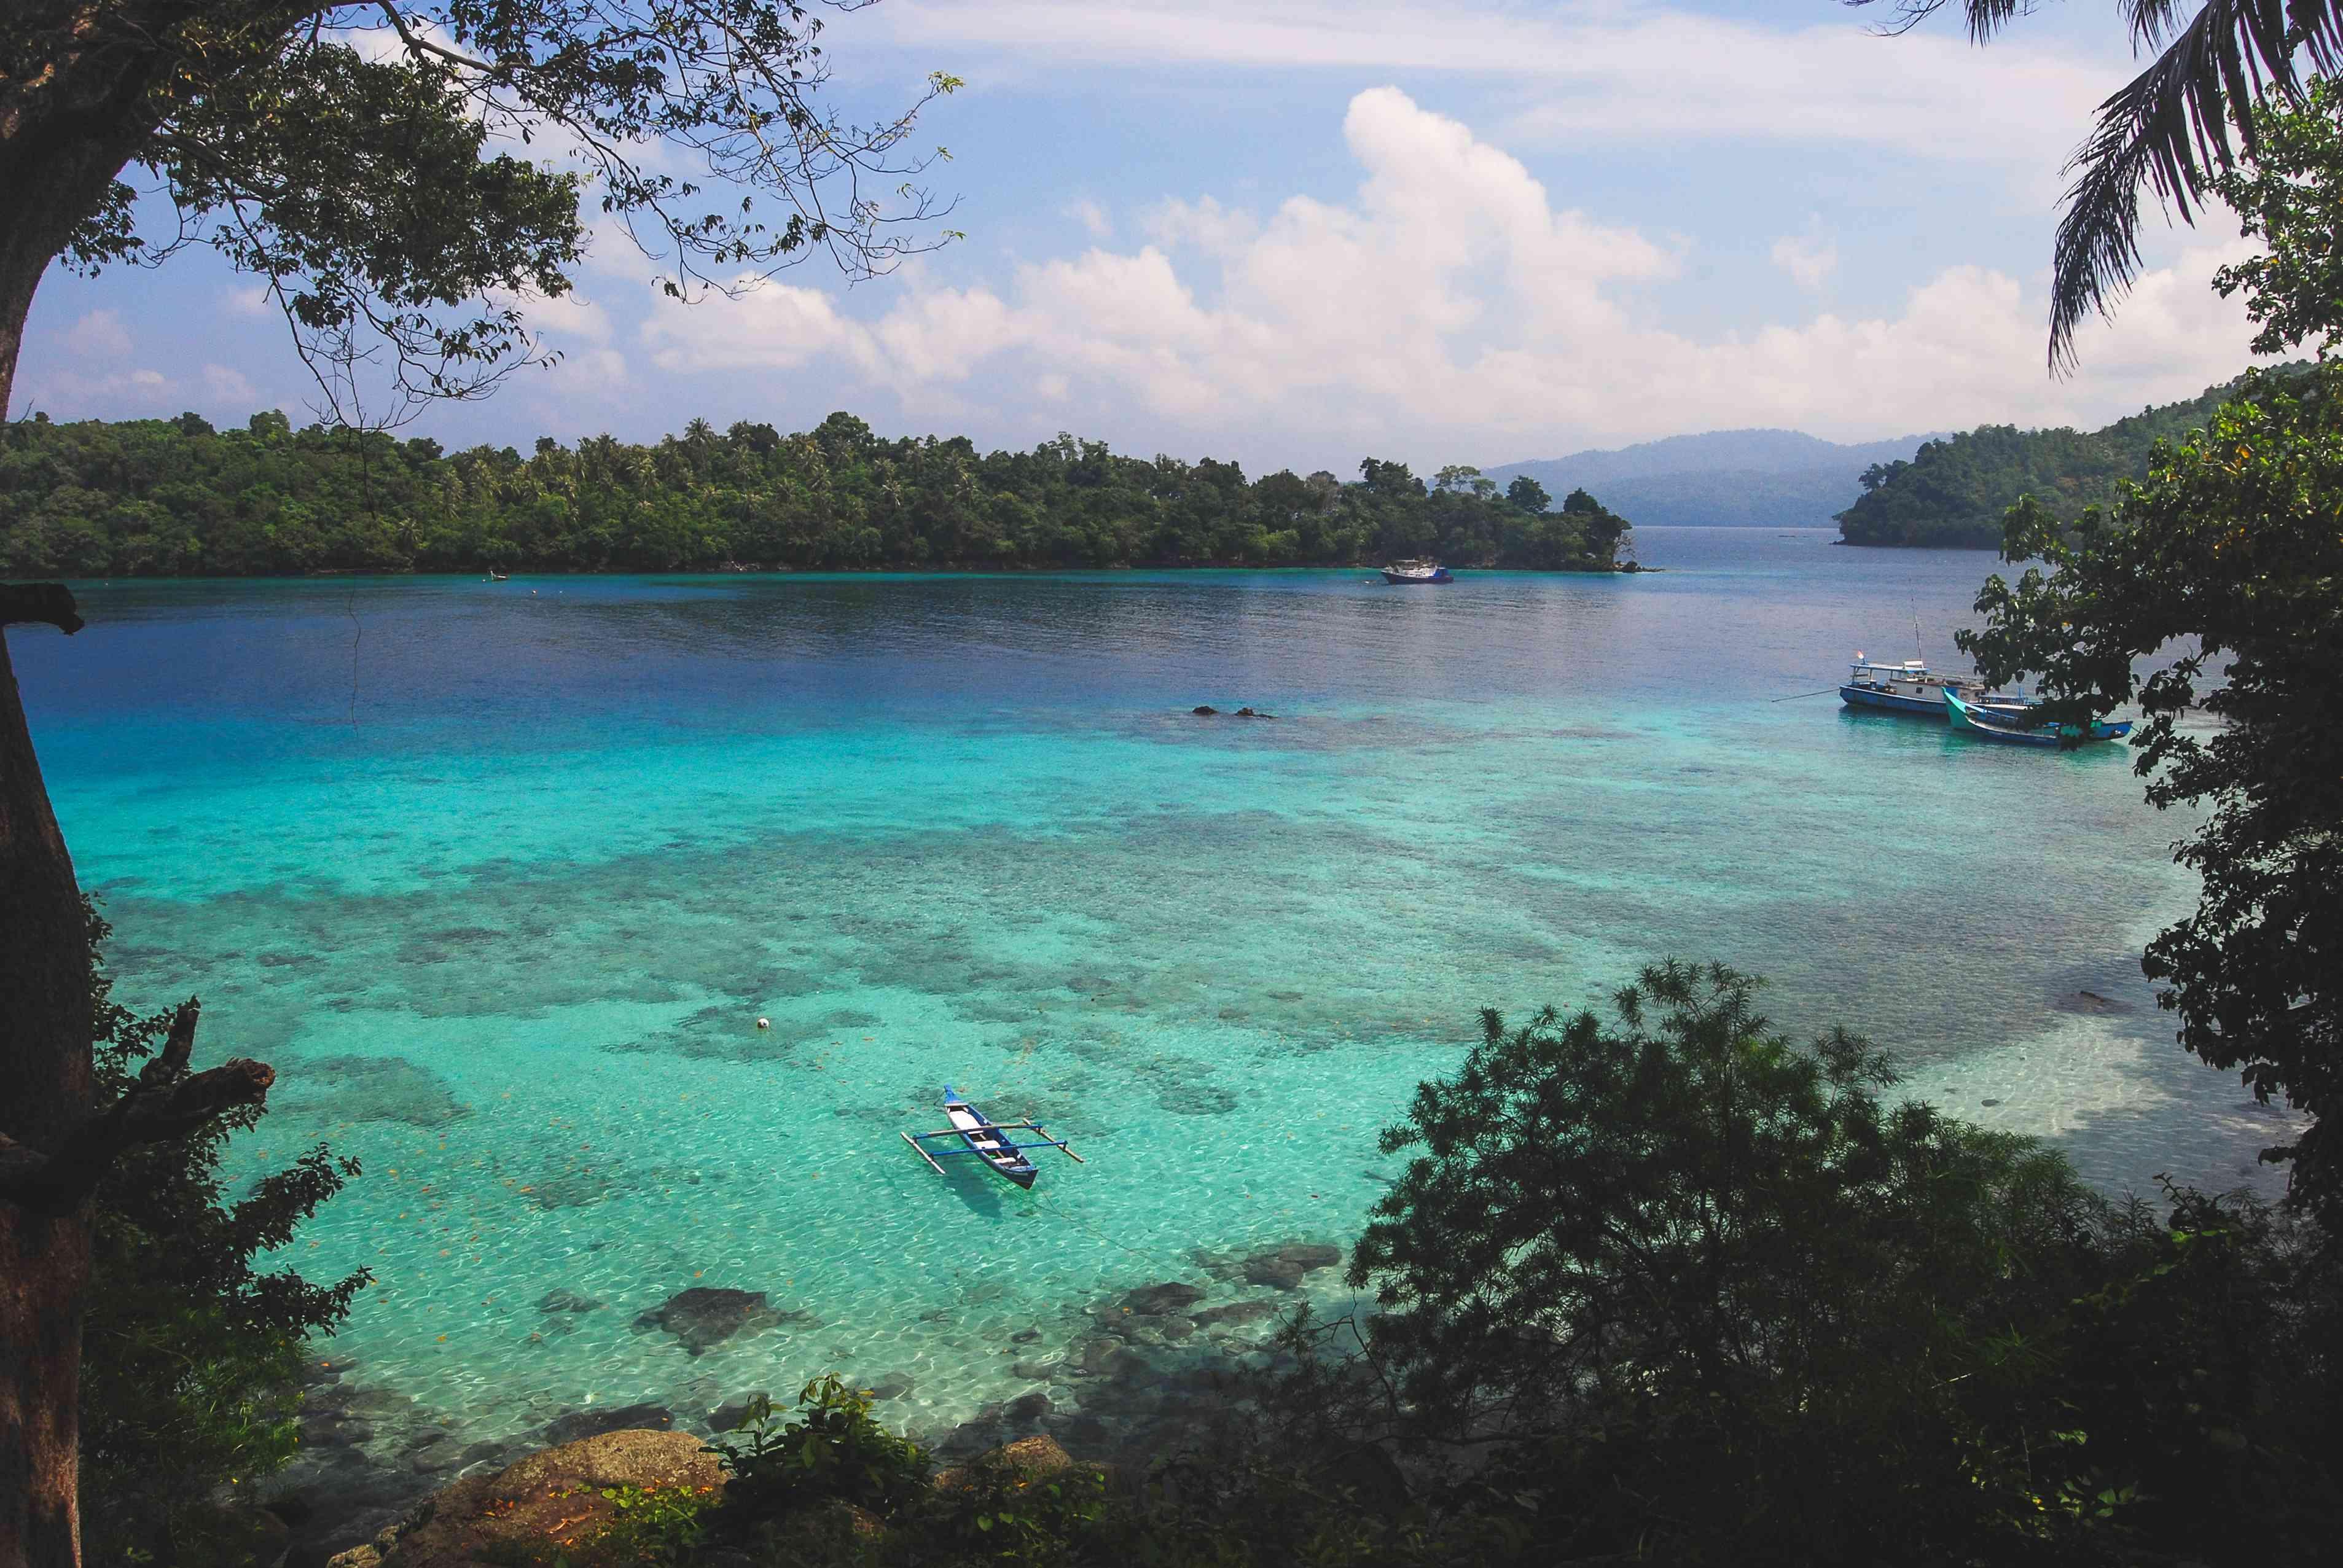 Bay at Pulau Weh in Sumatra